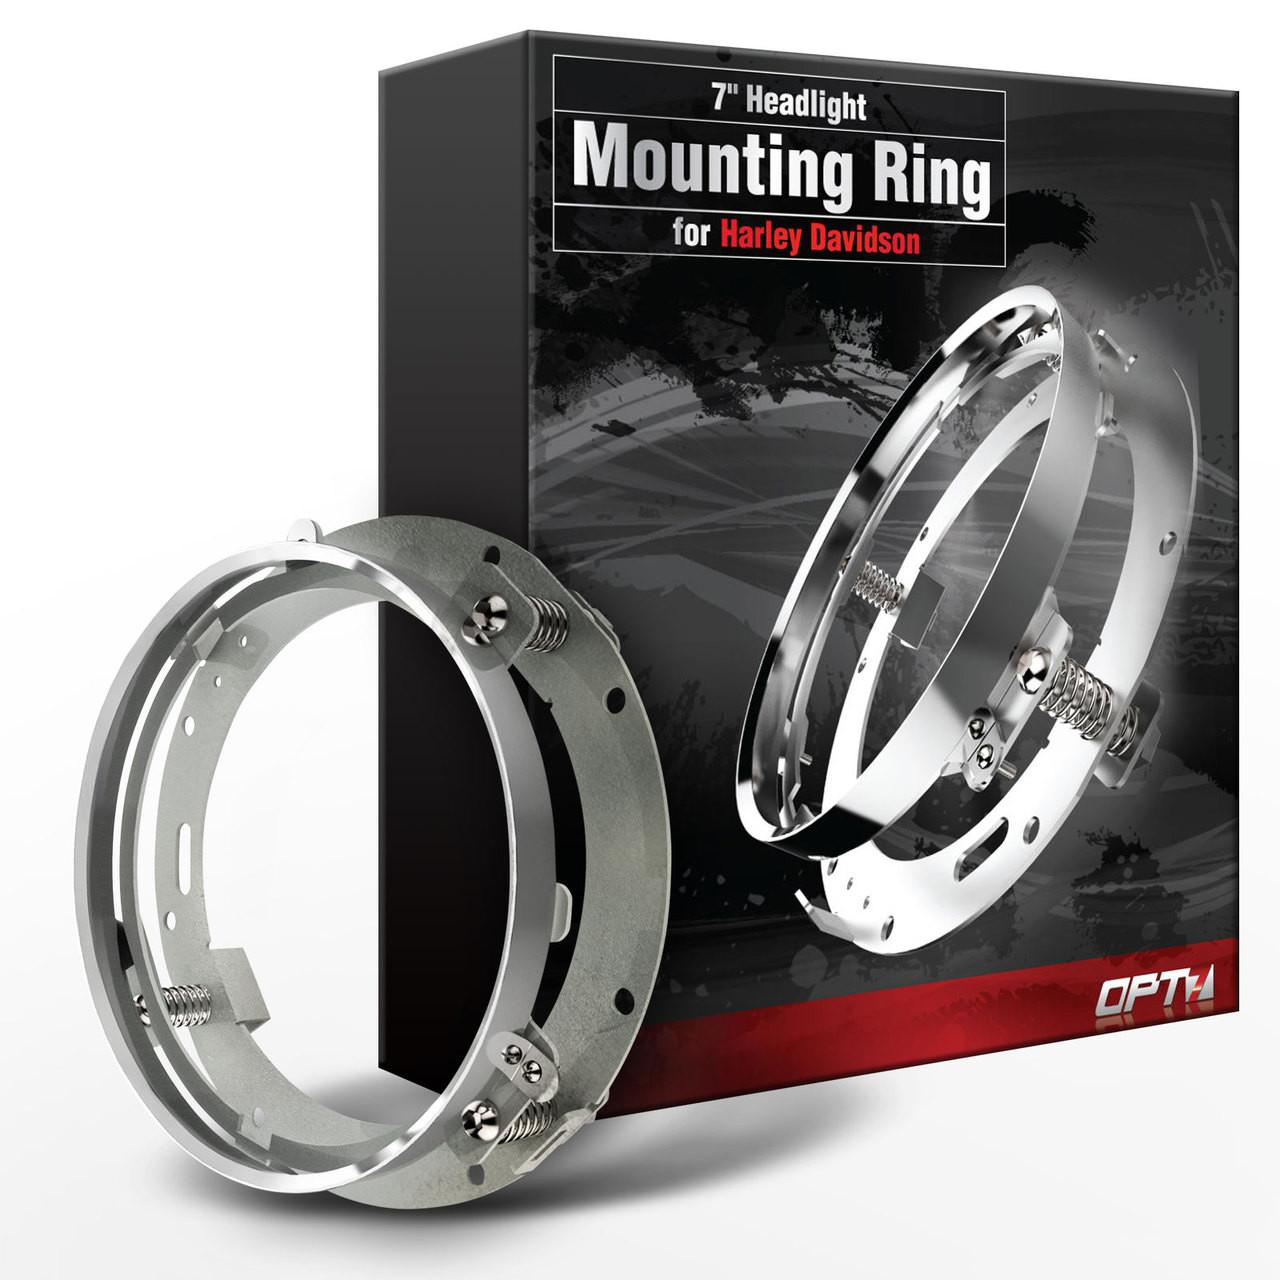 medium resolution of 7 inch led daymaker headlight mounting ring bracket for harley davidsons opt7